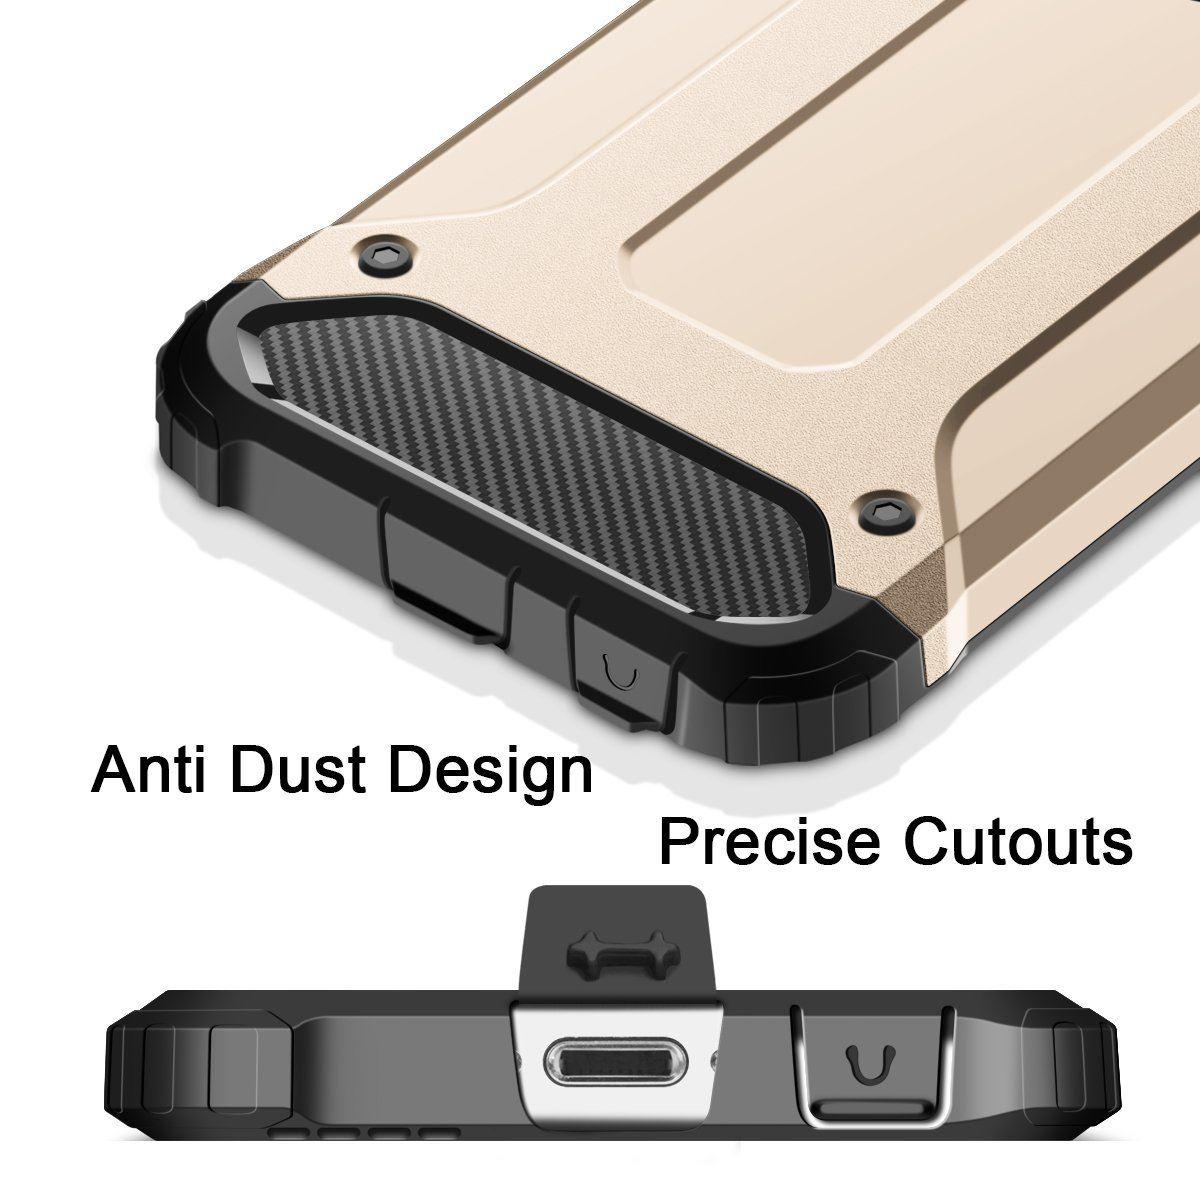 thumbnail 47 - For Apple iPhone 11 Pro Max XR Xs X 8 7 Plus 6 5 Se Case Cover Tough Armor